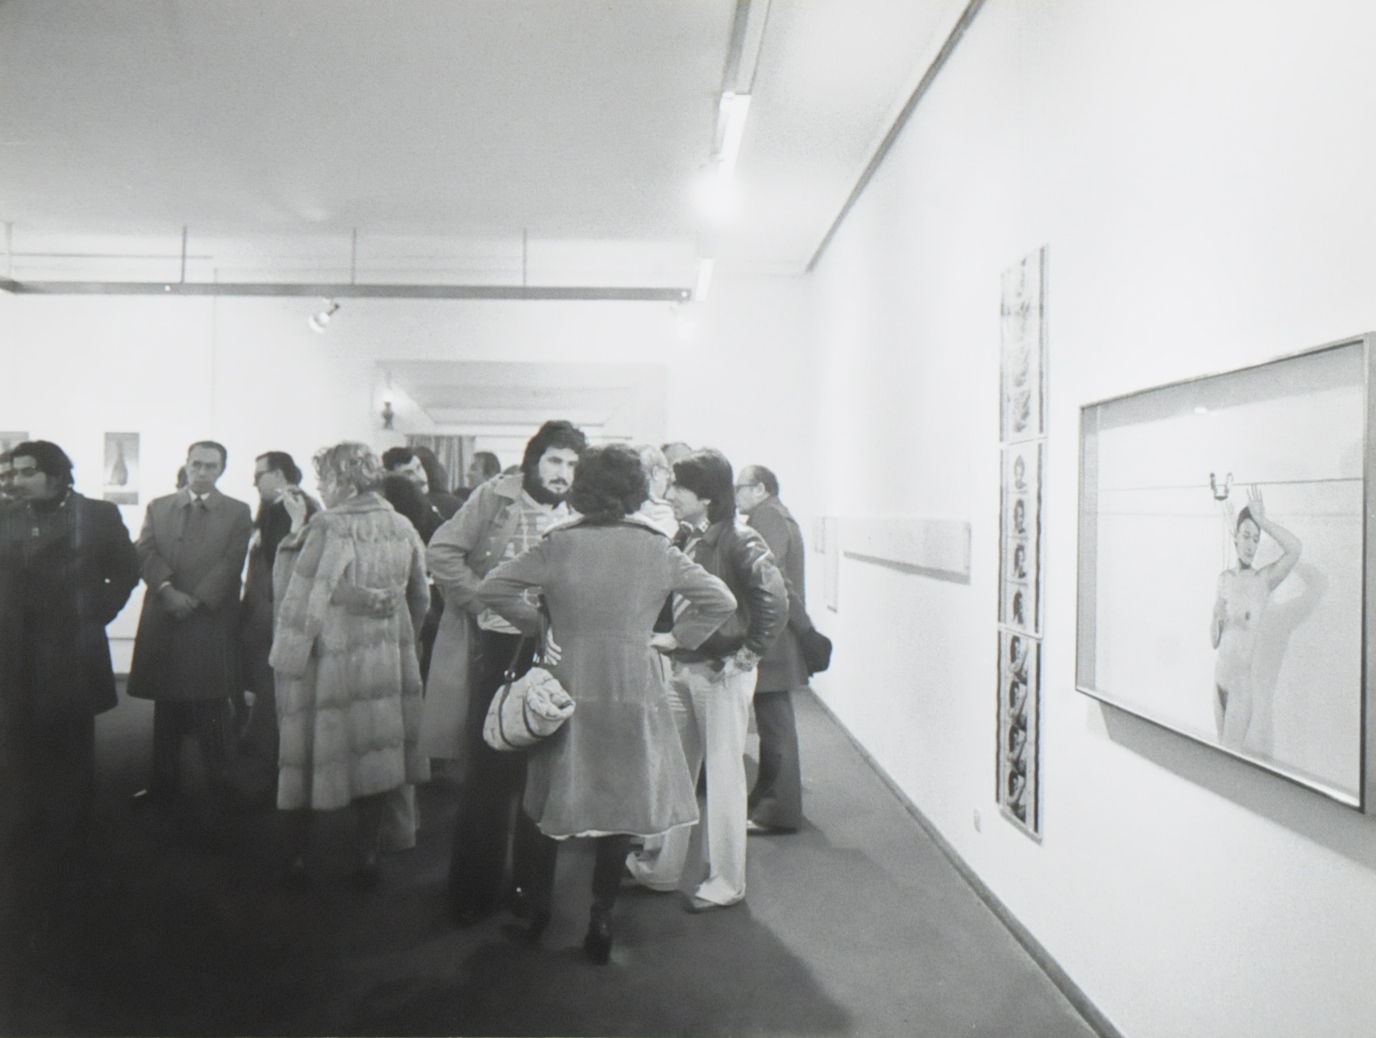 Galleria de foscherari mostra eros ghenos thanatos  pisani e  pascali .JPG